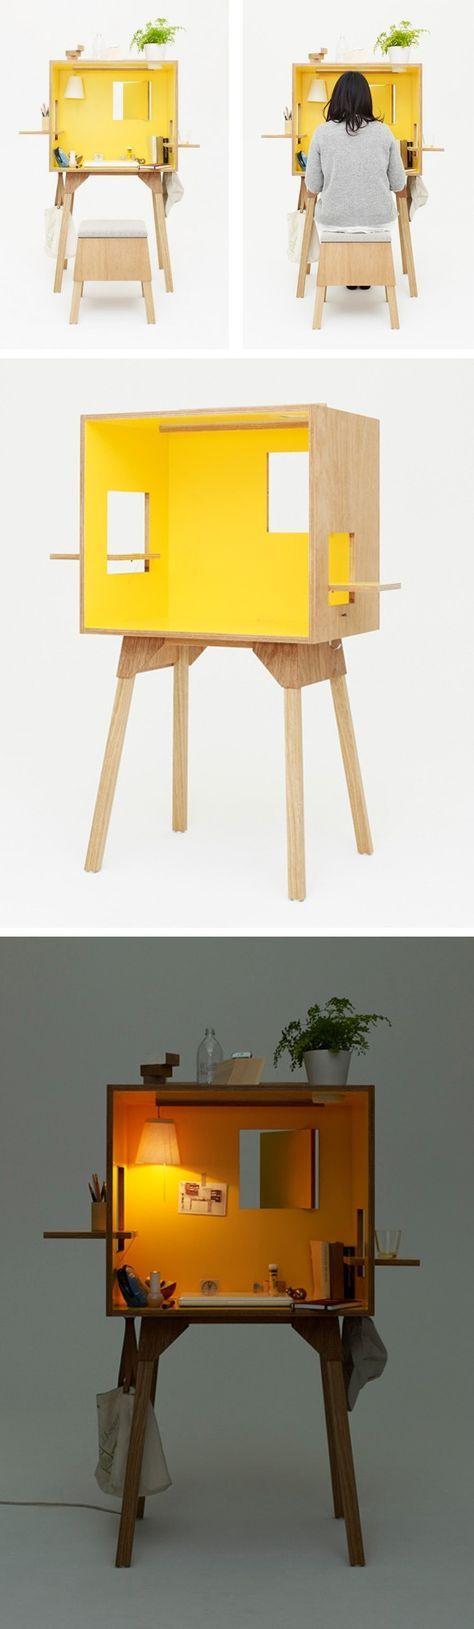 Koloro Desk par Torafu Architects - Journal du Design